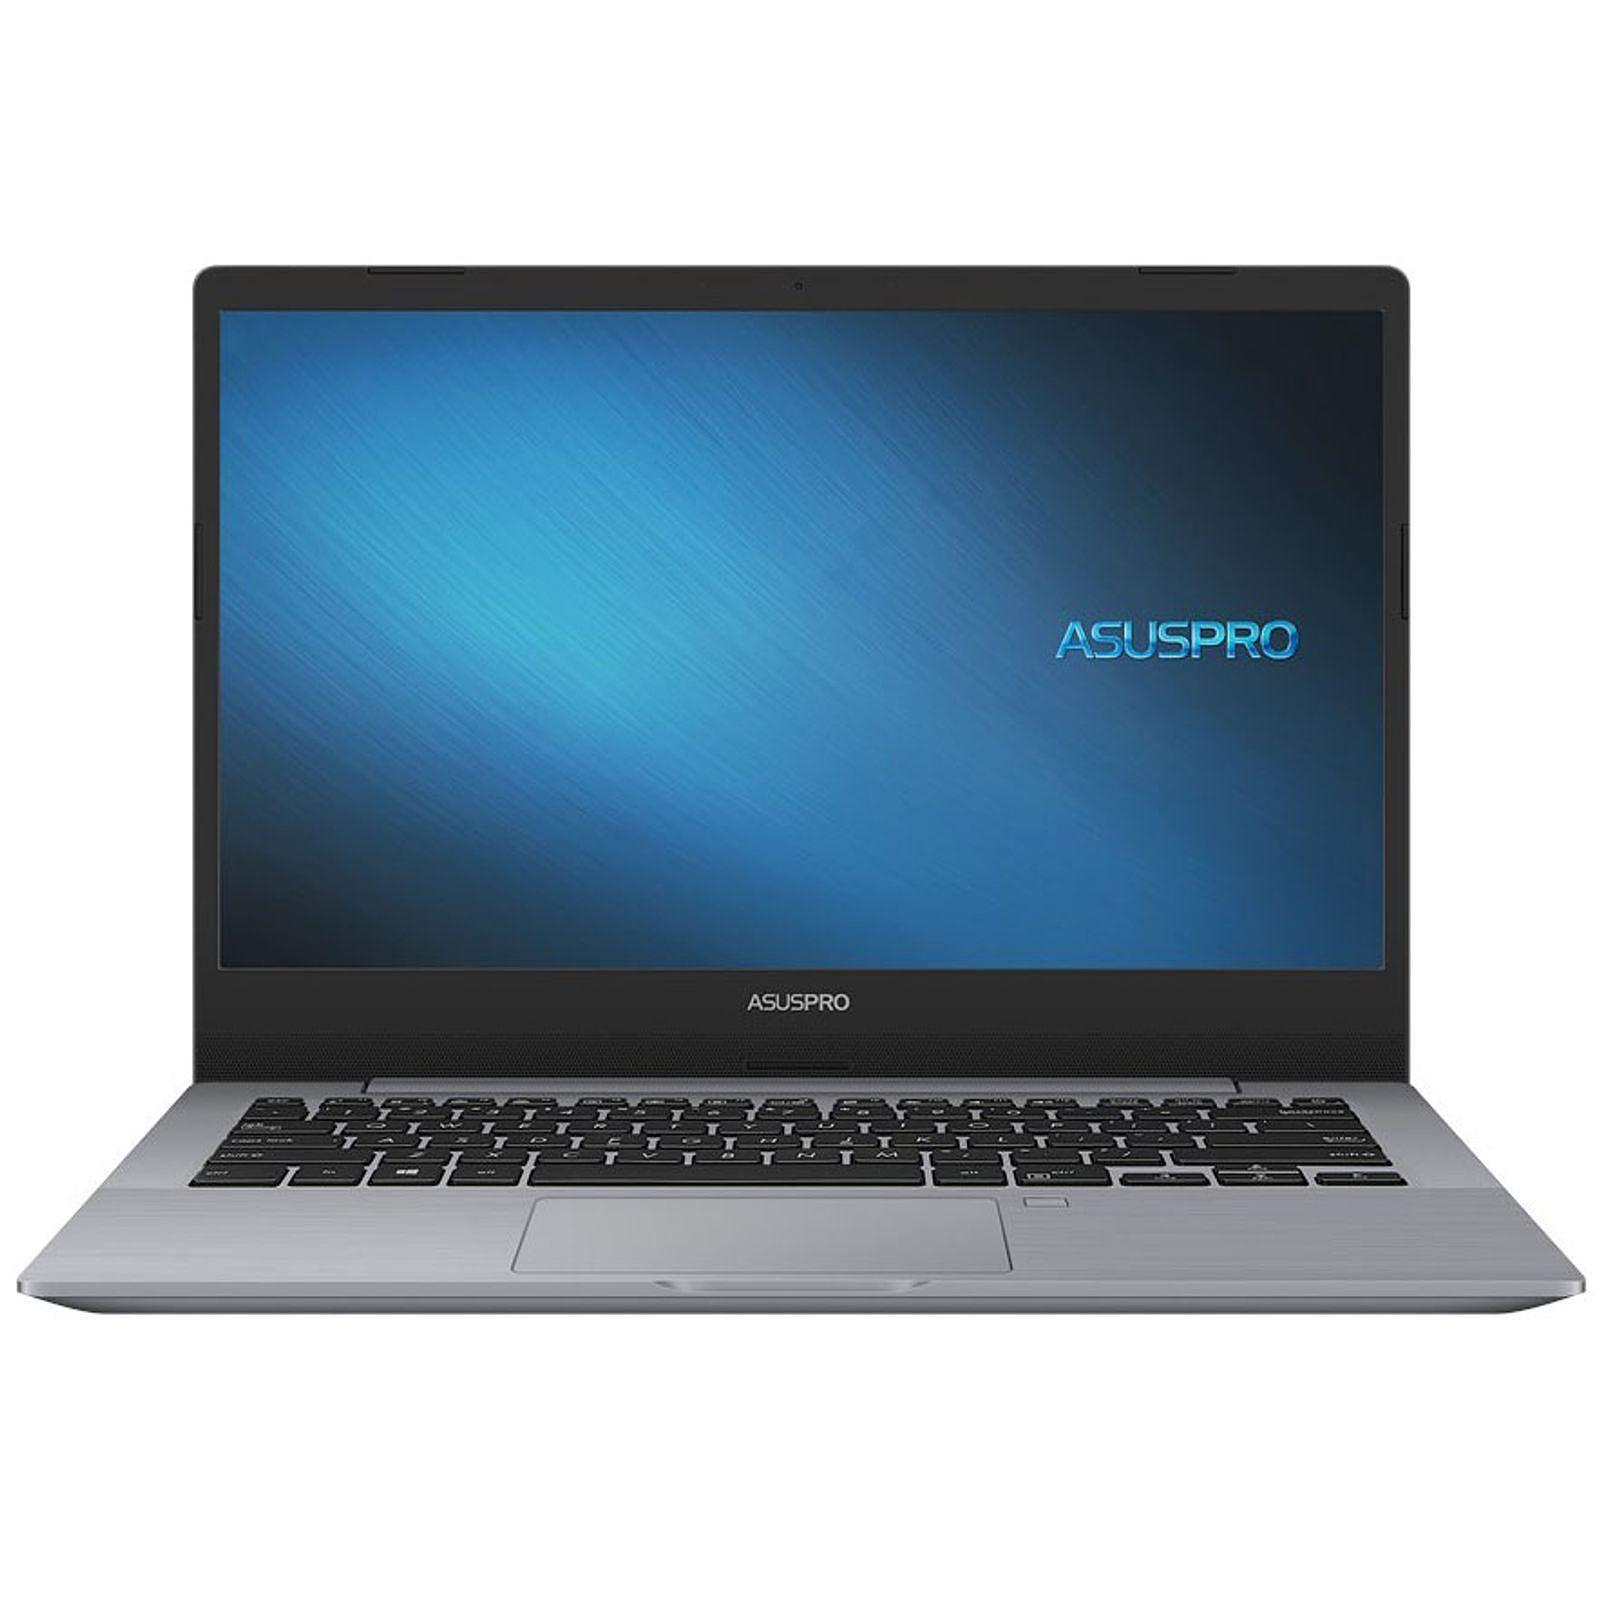 Asus 90NX01X1-M07820 - PC portable Asus - Cybertek.fr - 4